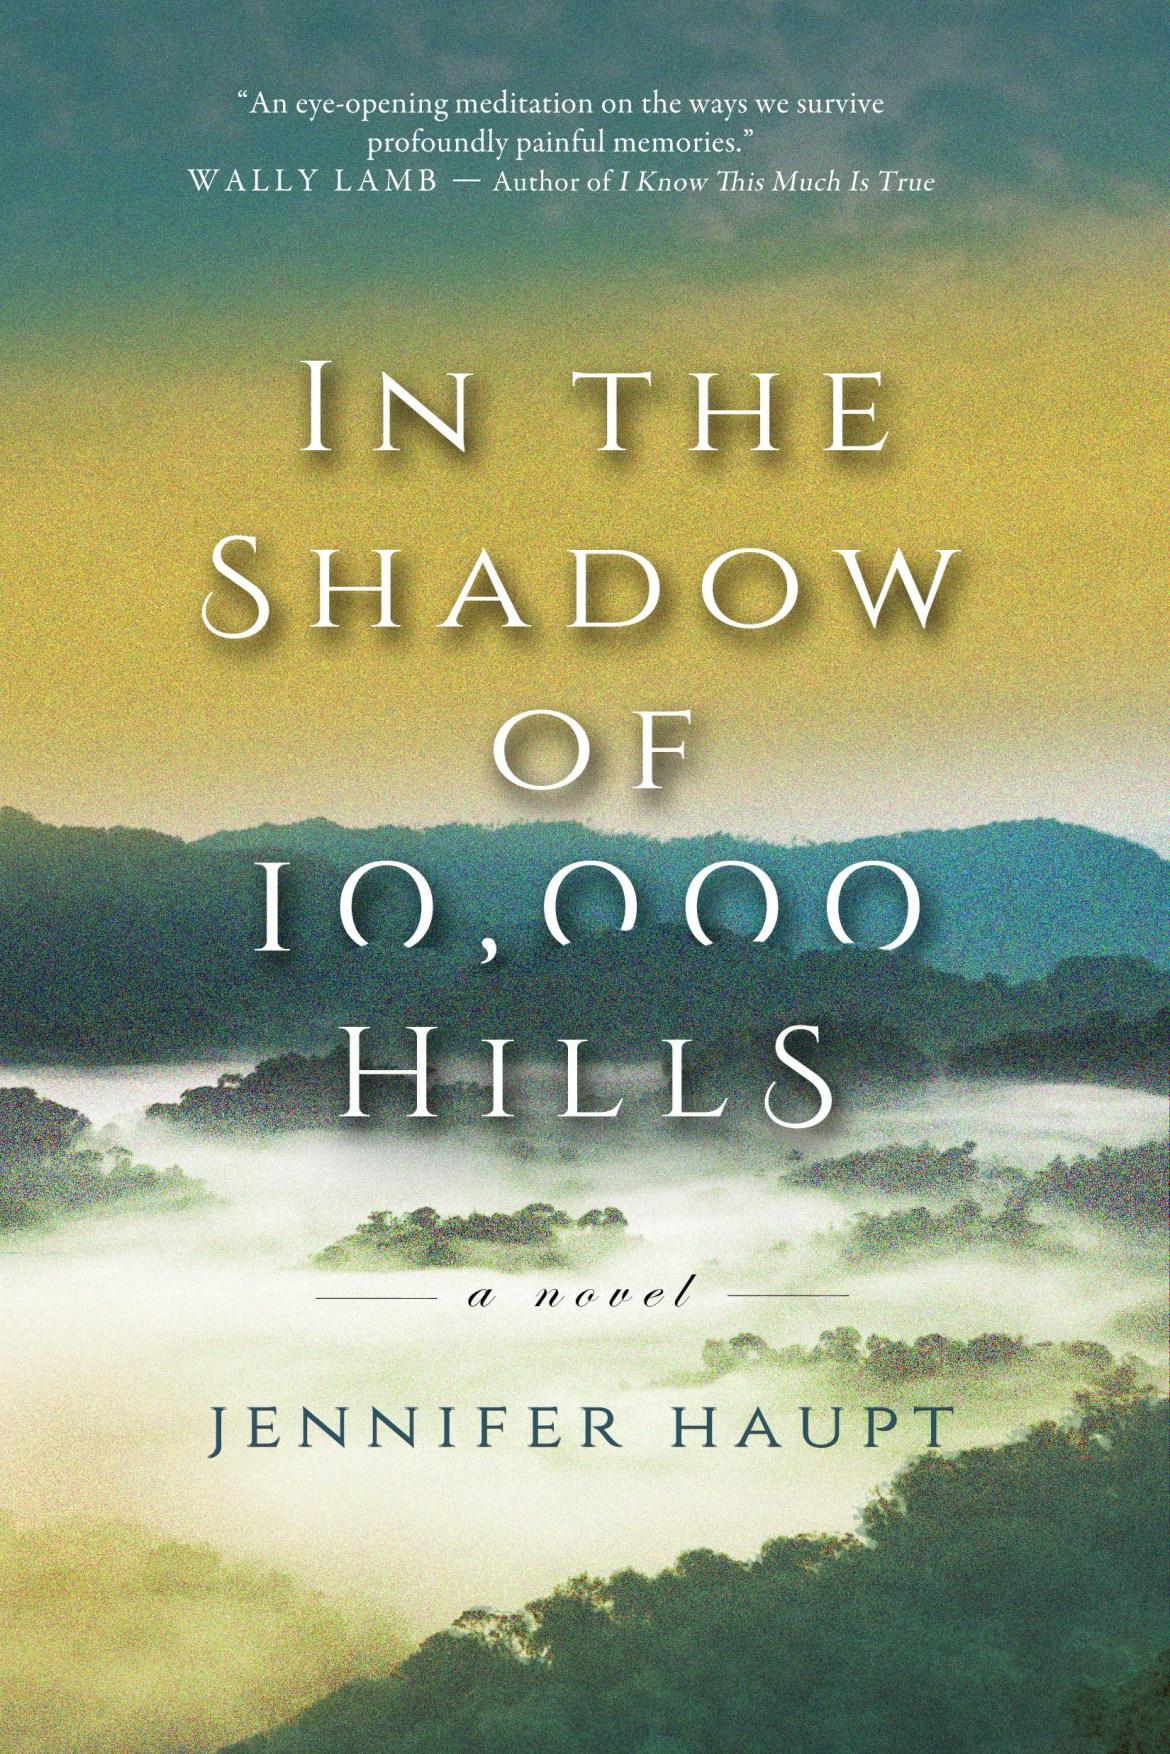 10,000 Hills Cover.jpg